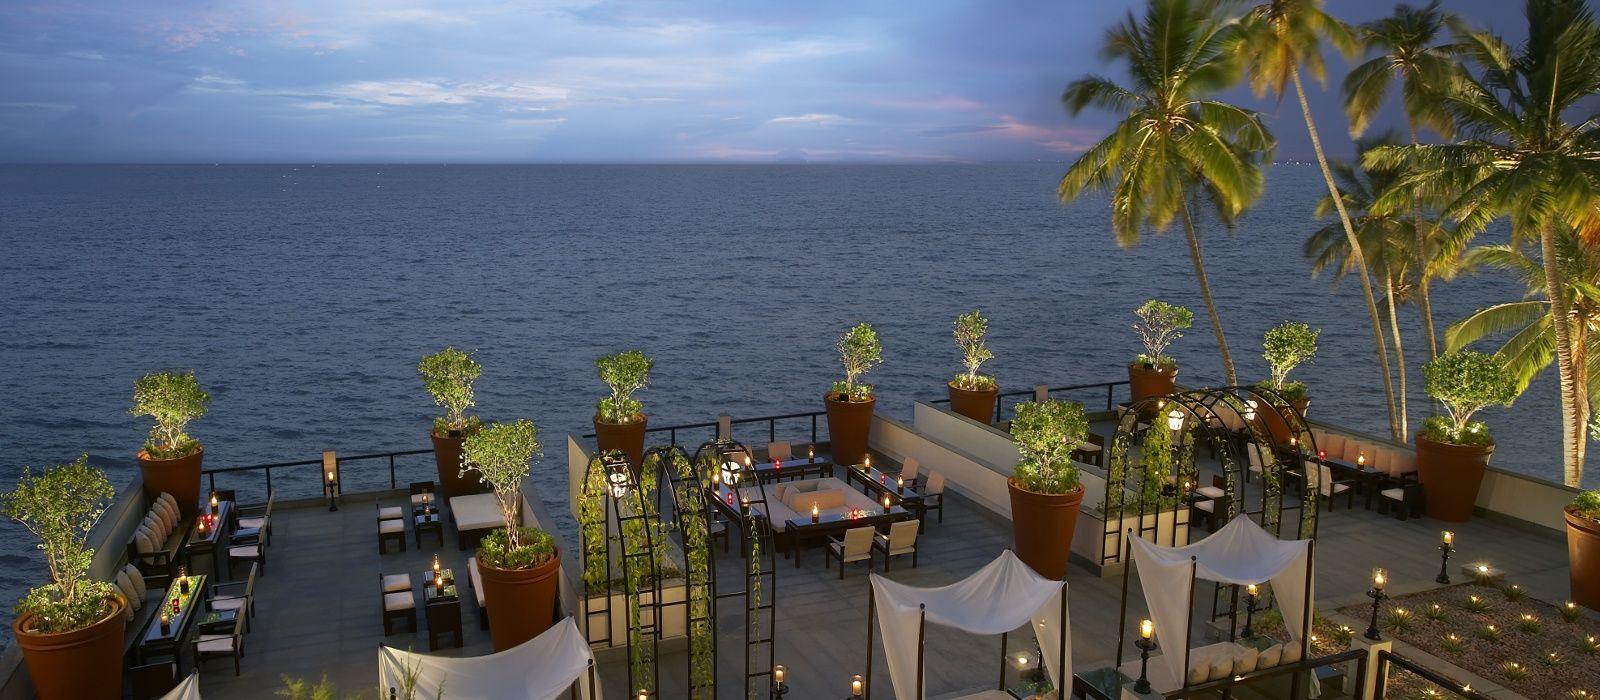 Hotel The Leela Kovalam Islands & Beaches